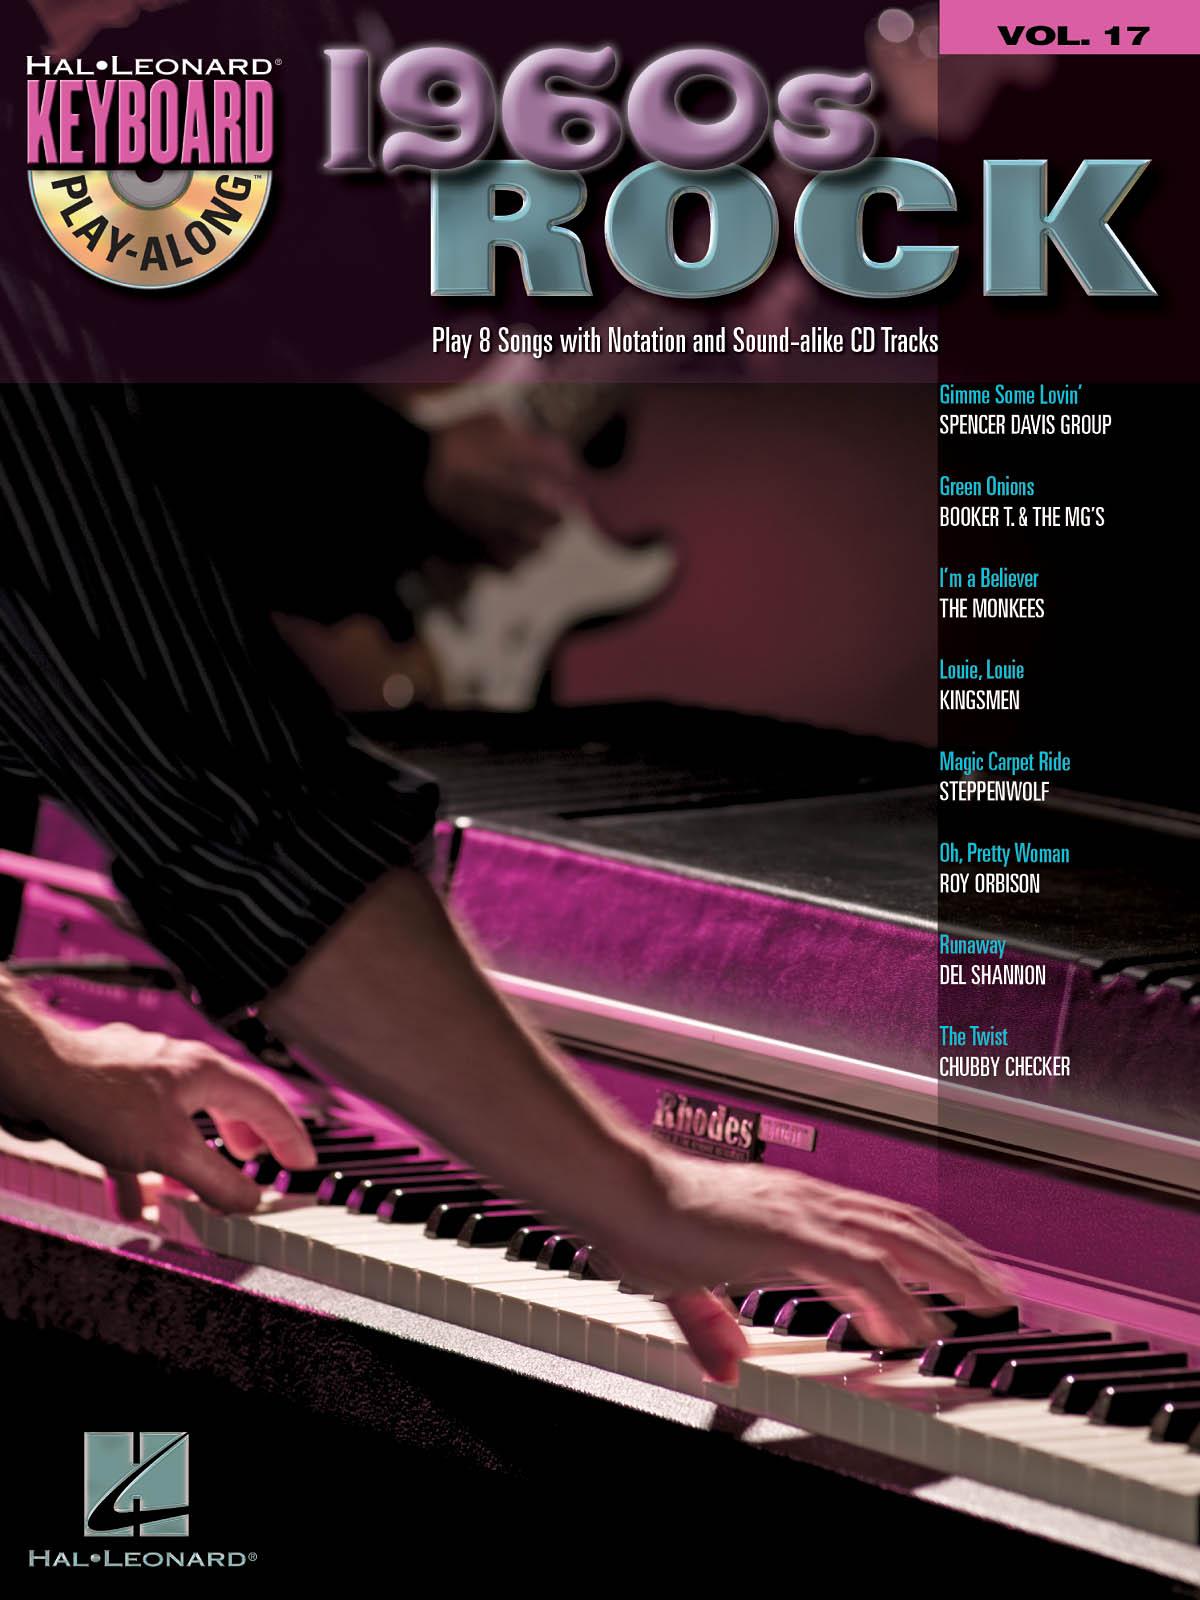 1960s Rock: Piano: Backing Tracks